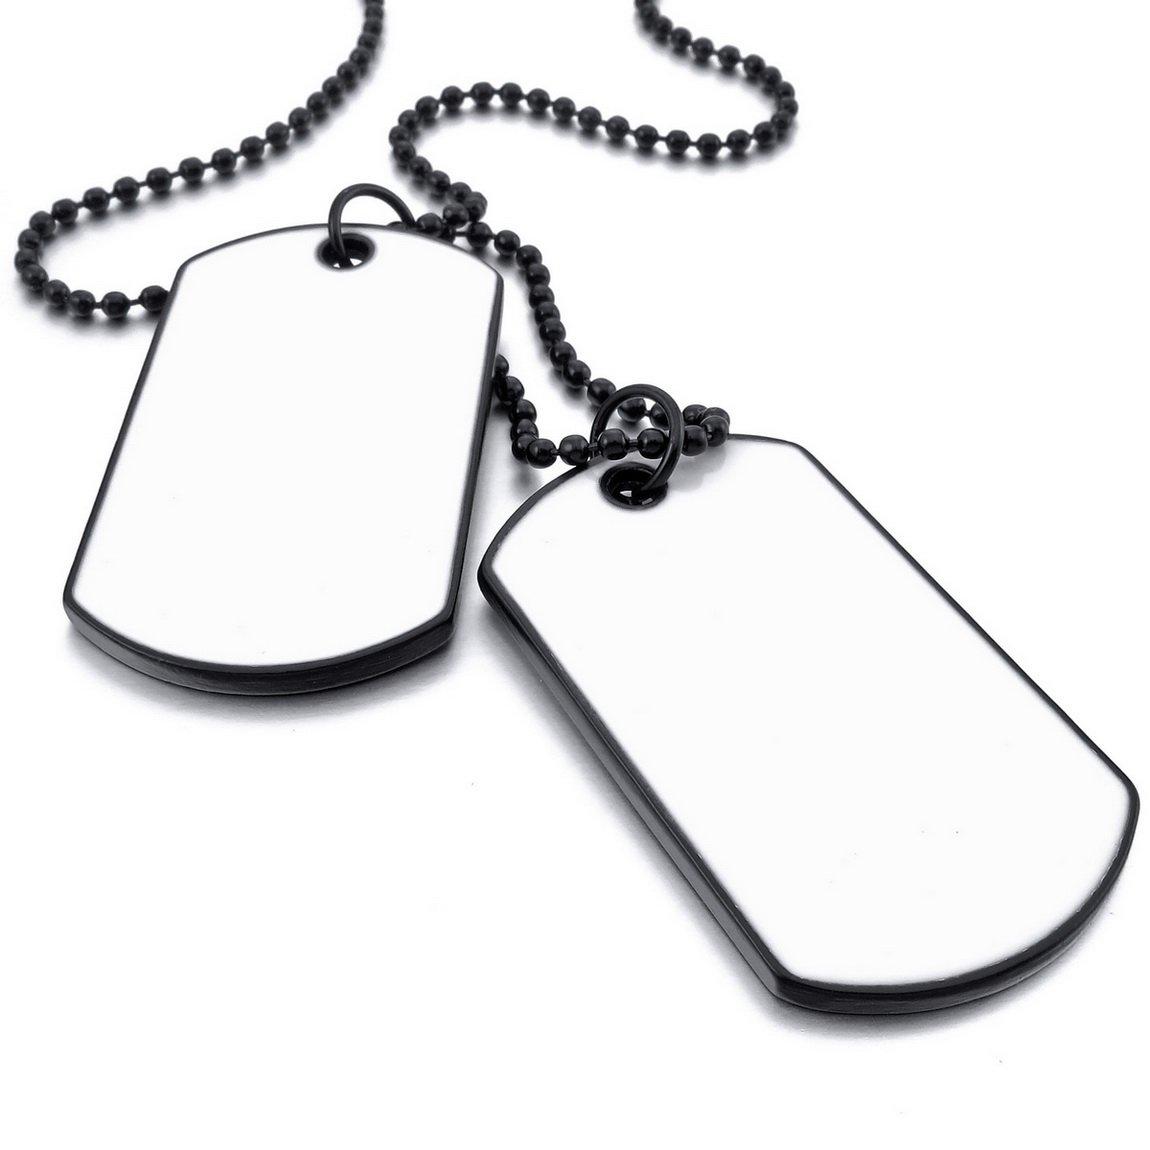 INBLUE Men,Women's 2PCS Alloy Pendant Necklace White Black Double Dog Tag Army Style Tribal 26 Inch Chain